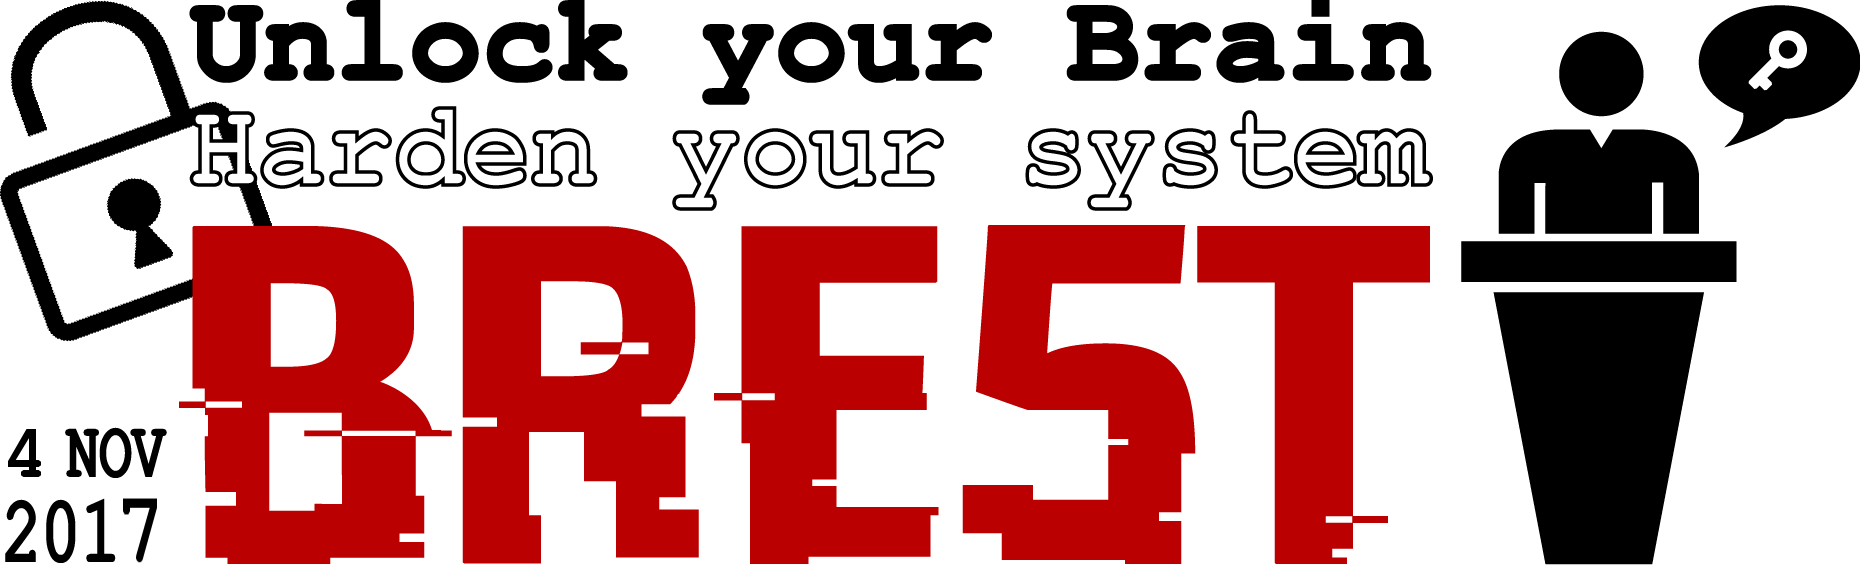 #savethedate Conférence Unlock Your Brain, Harden Your System @ A définir